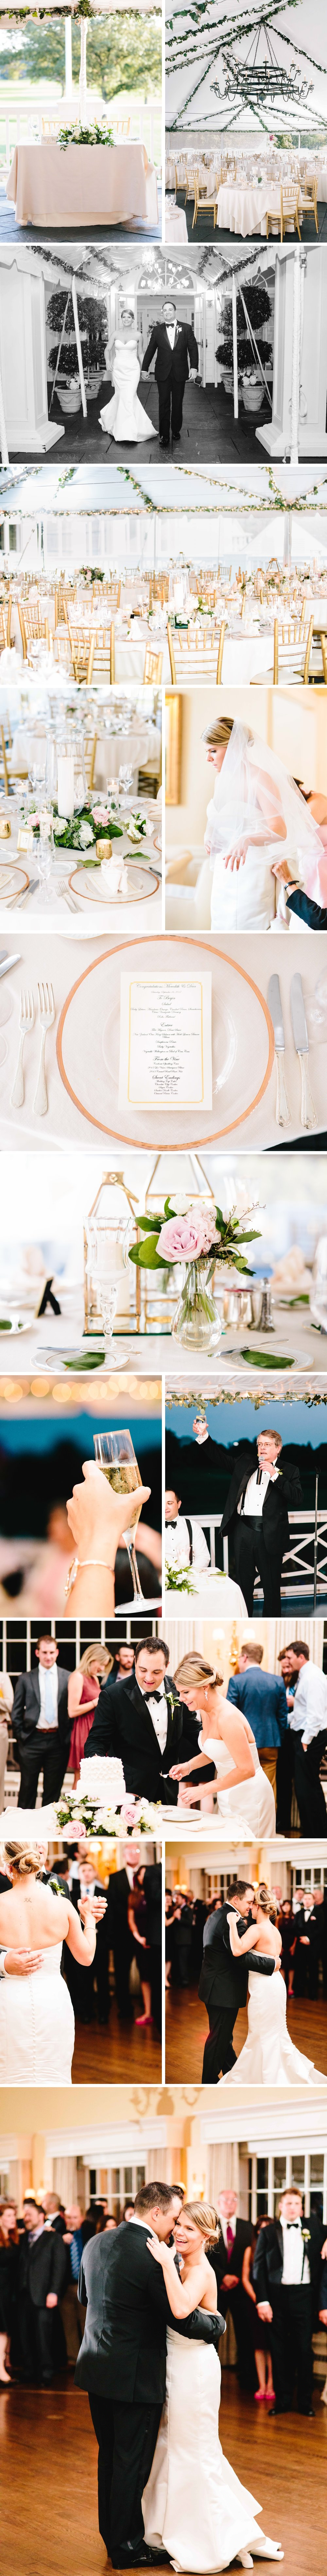 chicago-fine-art-wedding-photography-niemiec5